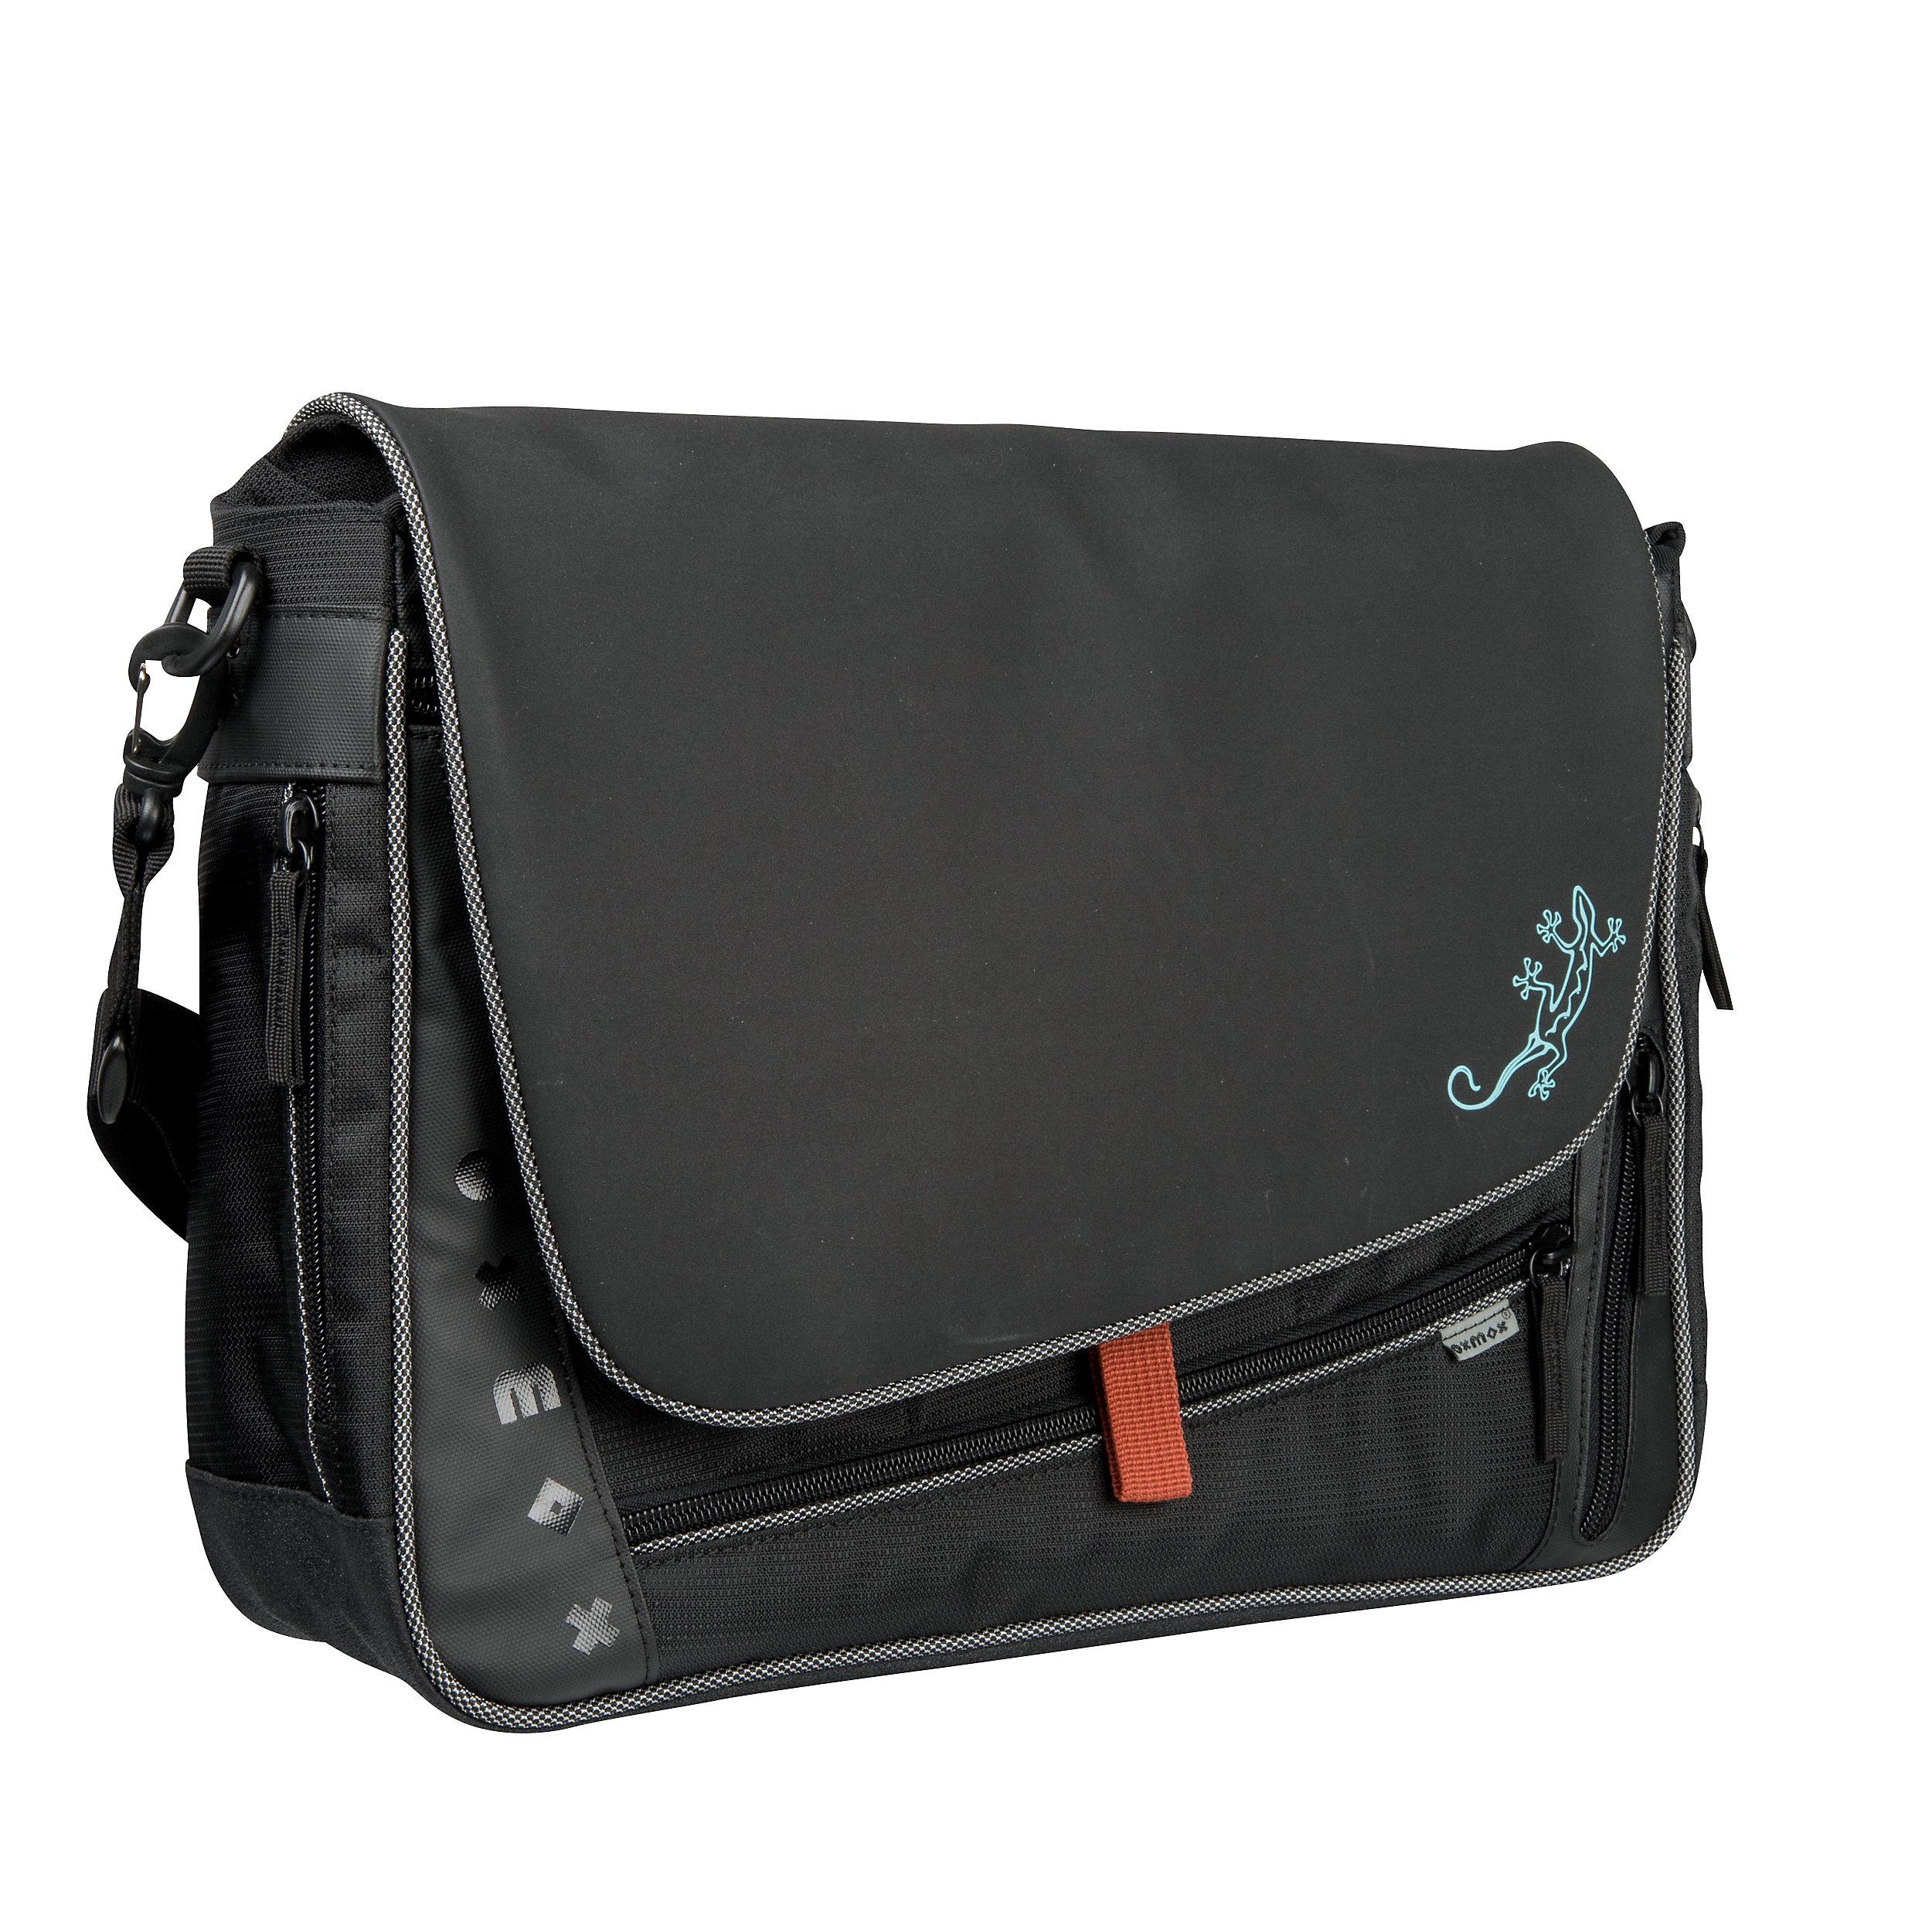 "Messenger Bag M 15"" New Cryptan"